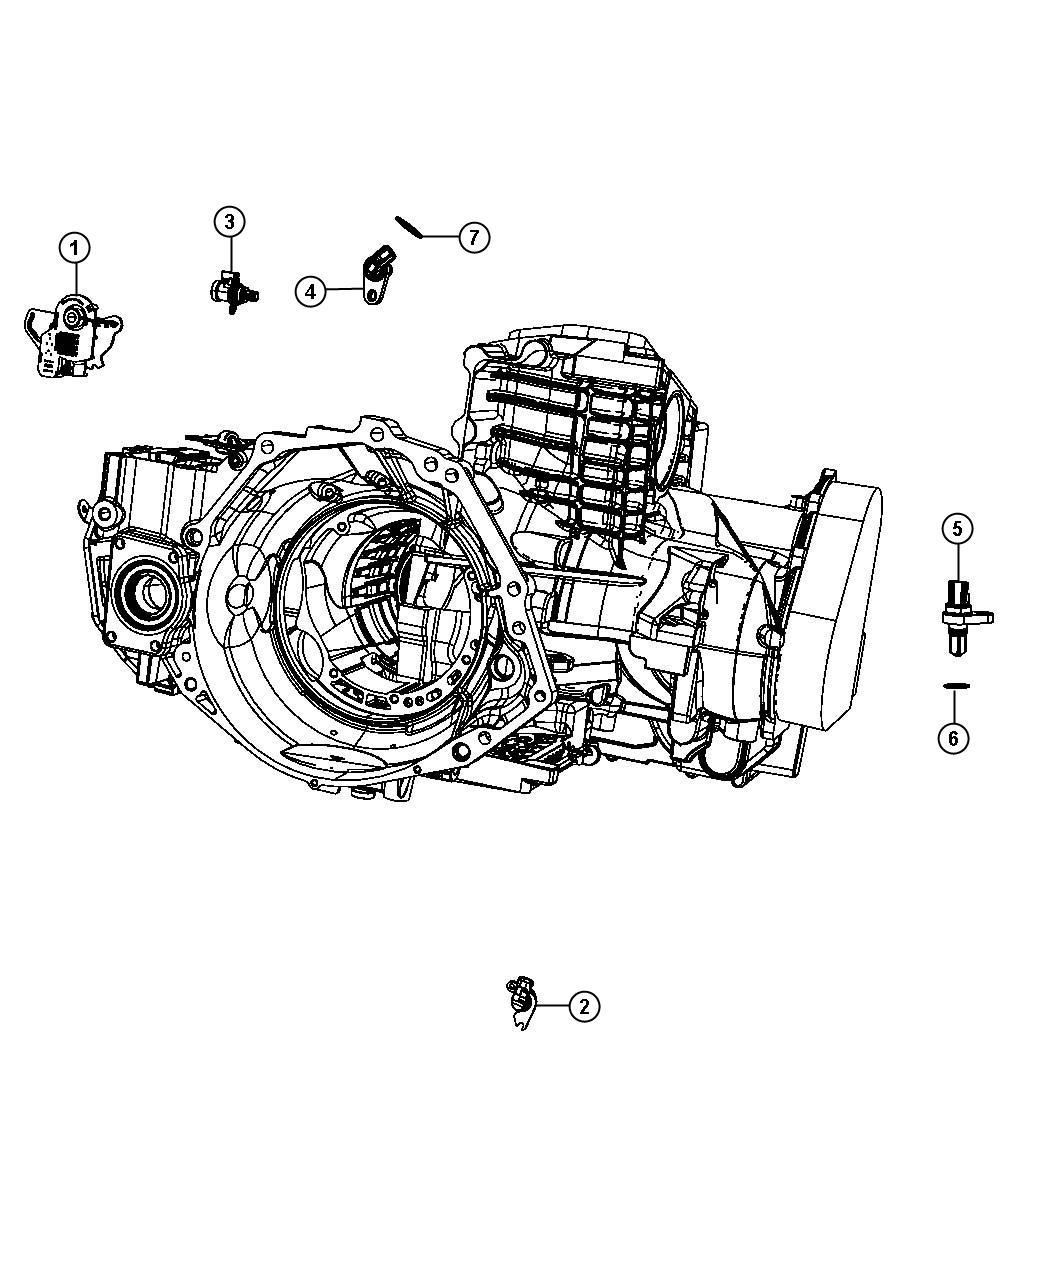 2002 Dodge Ram Van Engine Diagram Schematics Data Wiring Diagrams 1999 Caravan Grand Additionally 2500 59